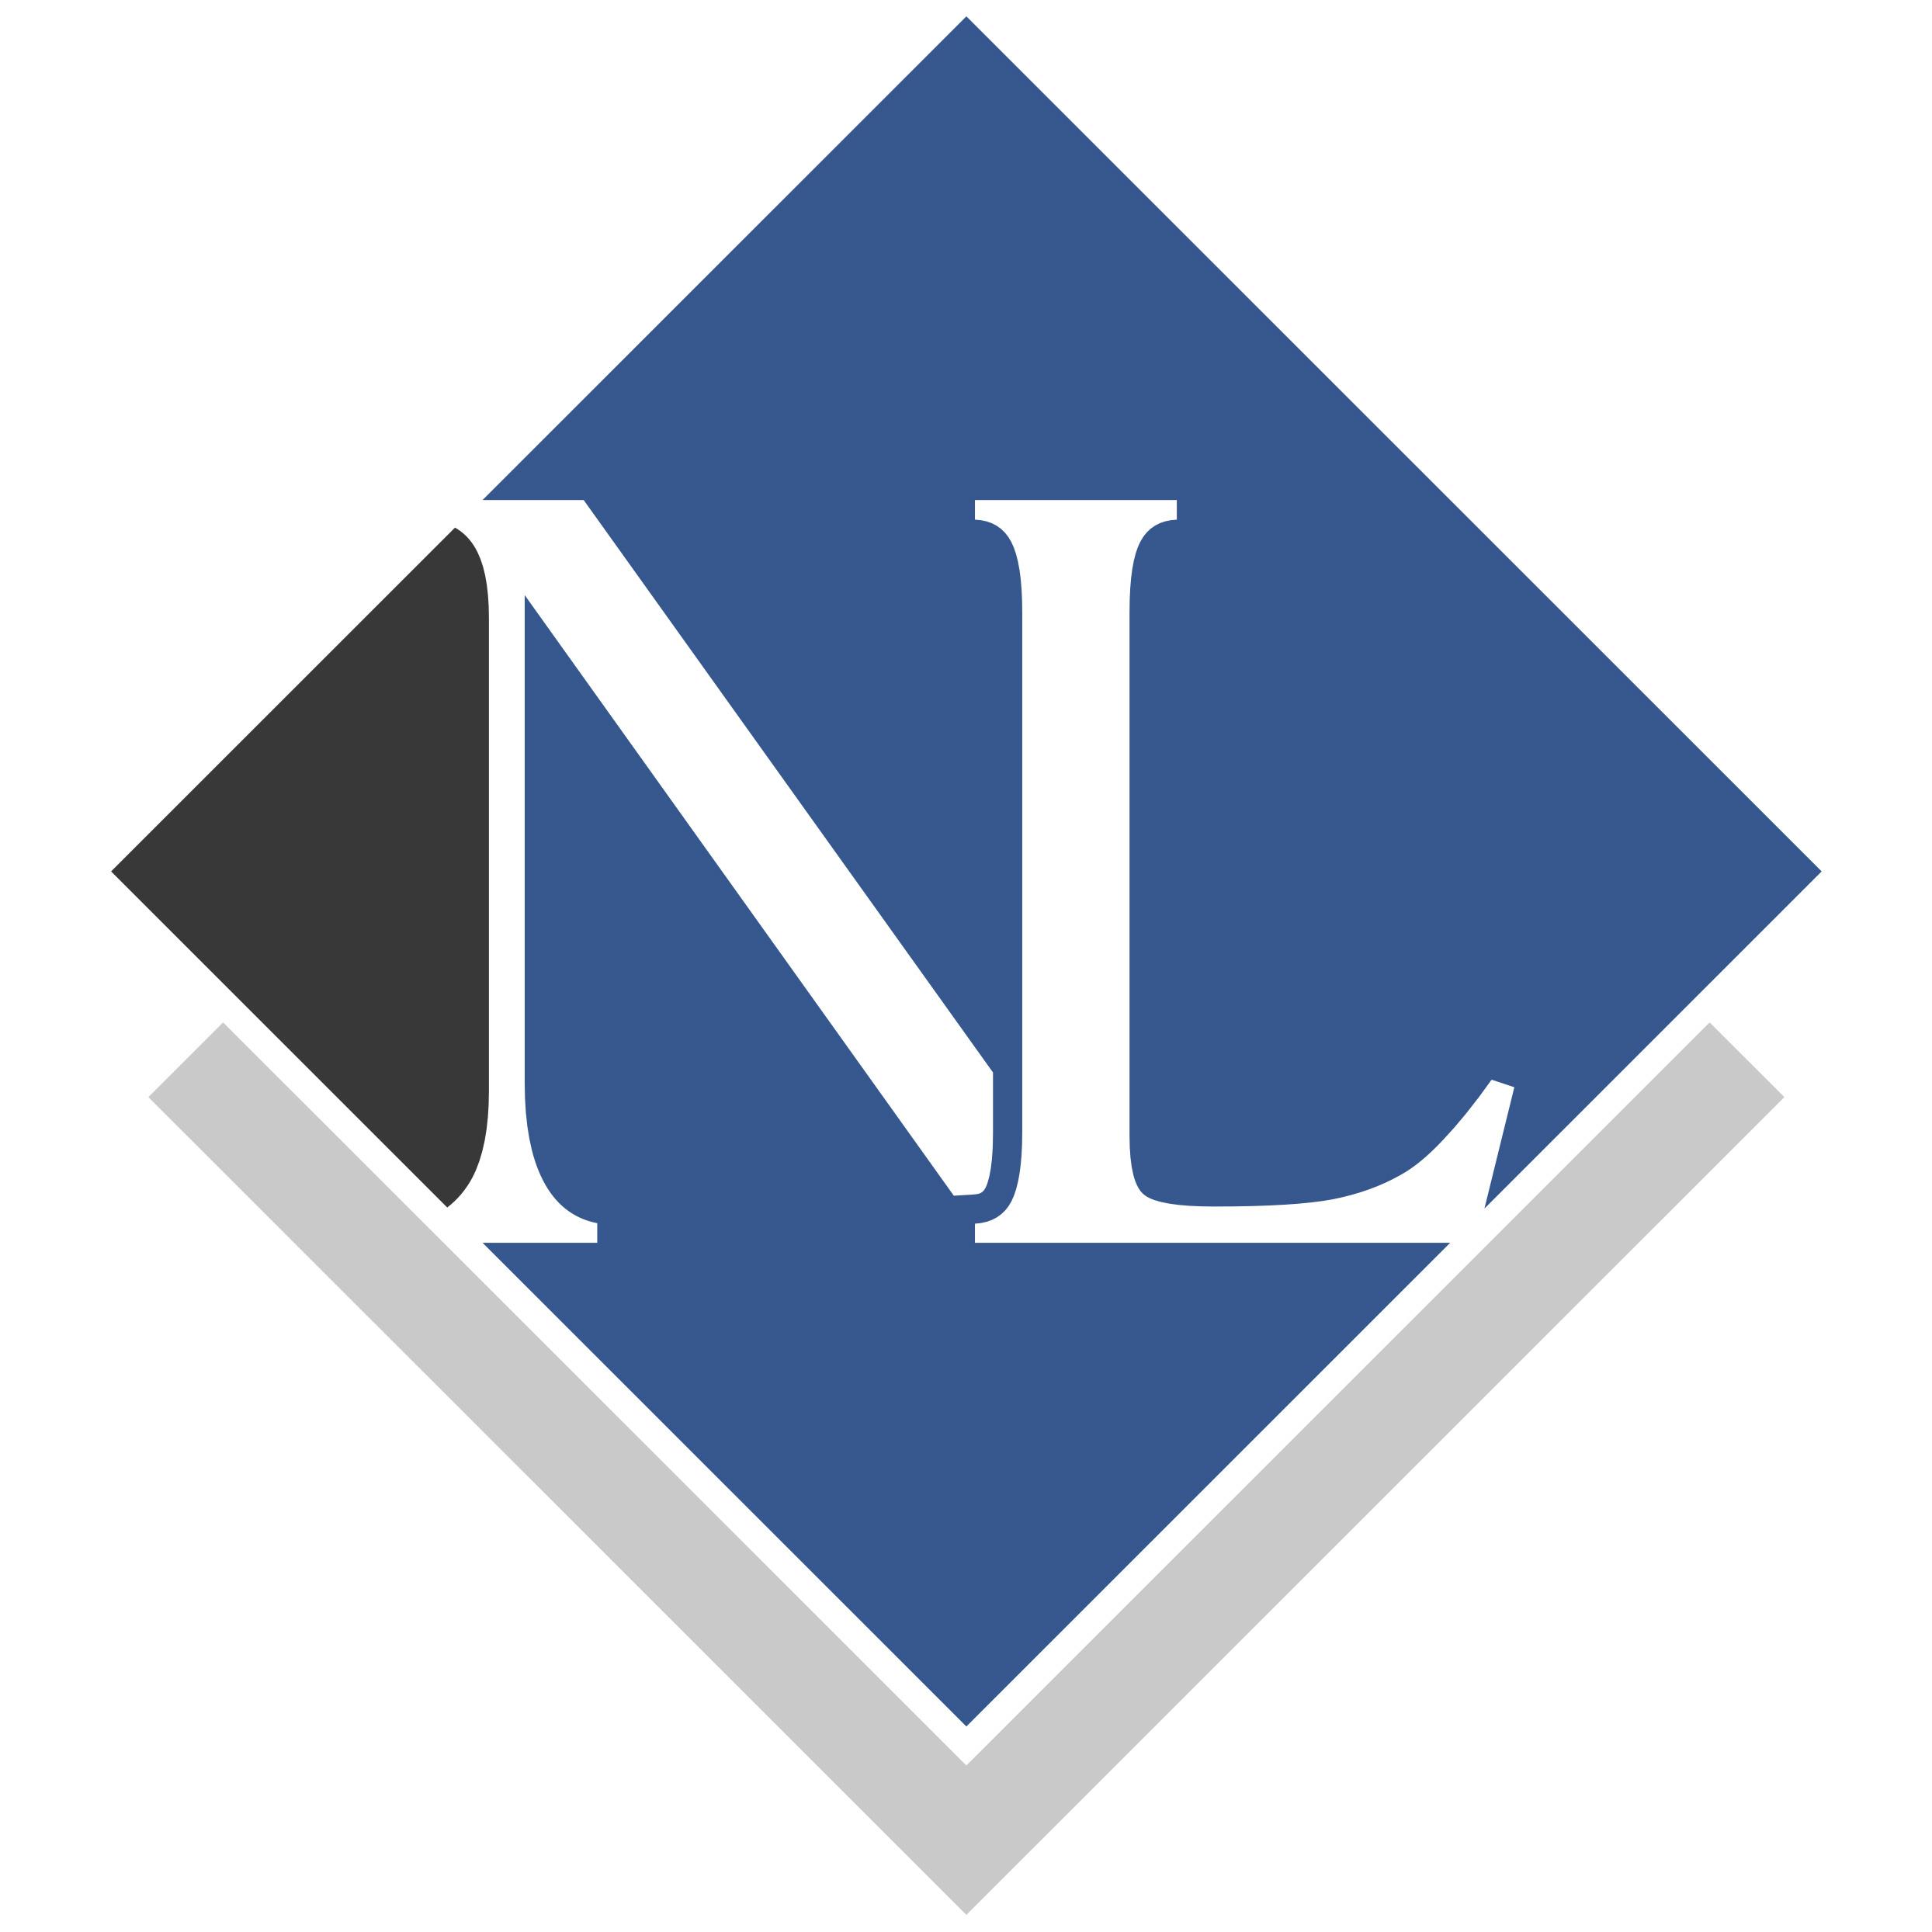 Employment Attorney in NH Laconia 03246 NICHOLS LAW 1083 UNION AVENUE  (603)527-8267